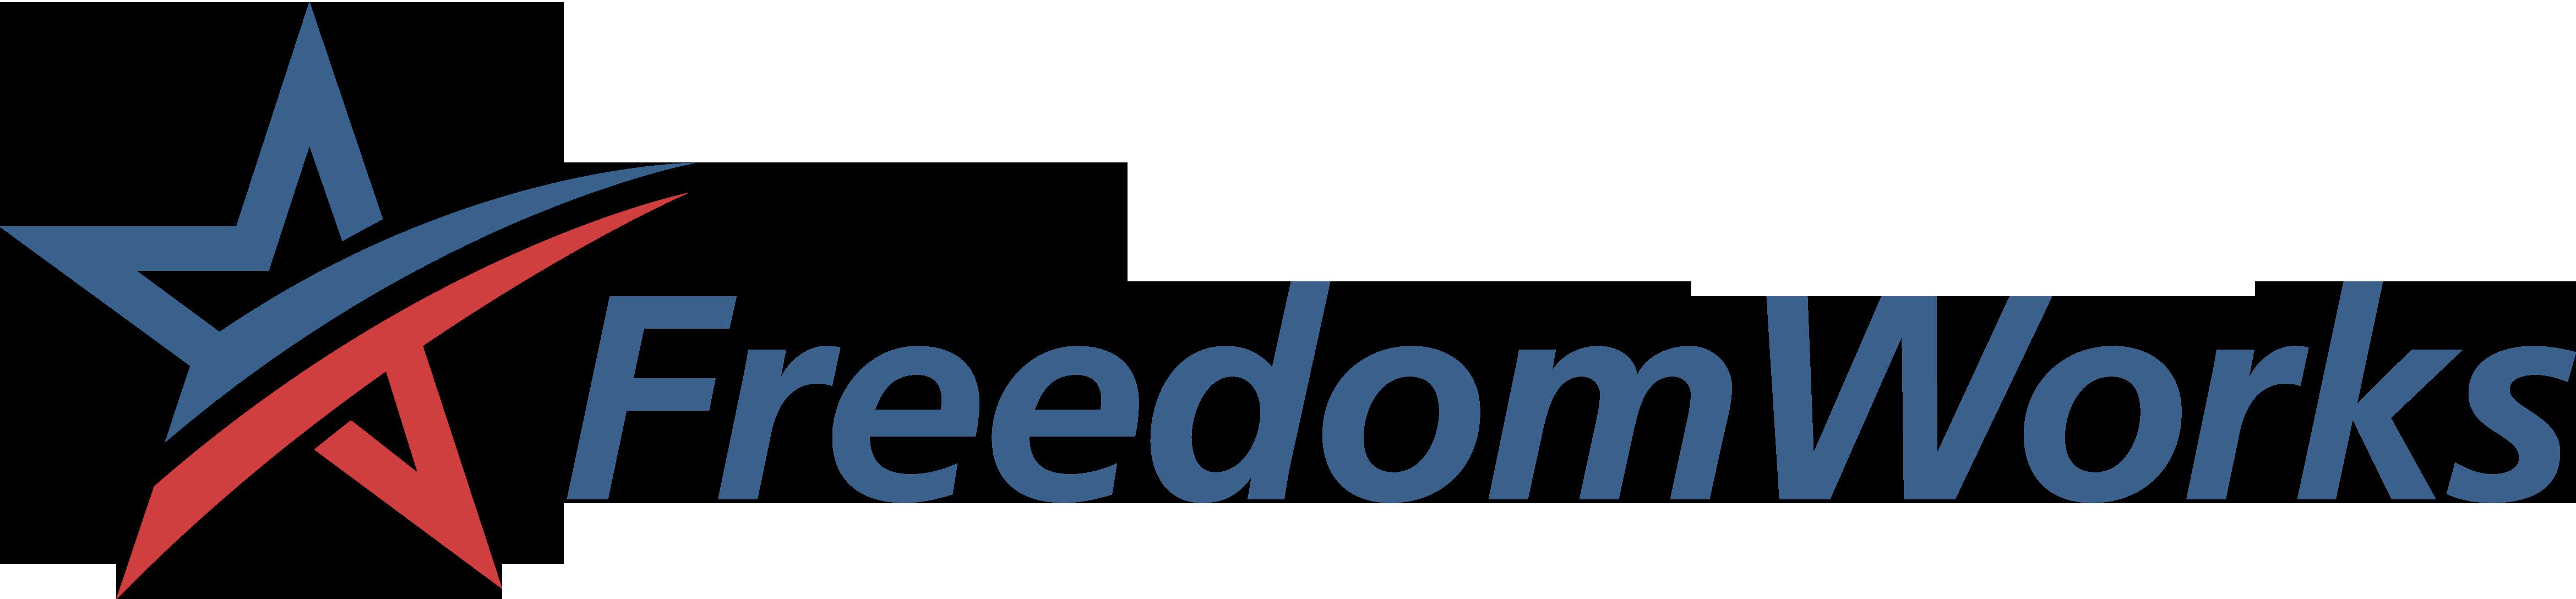 fw-logo-print.png